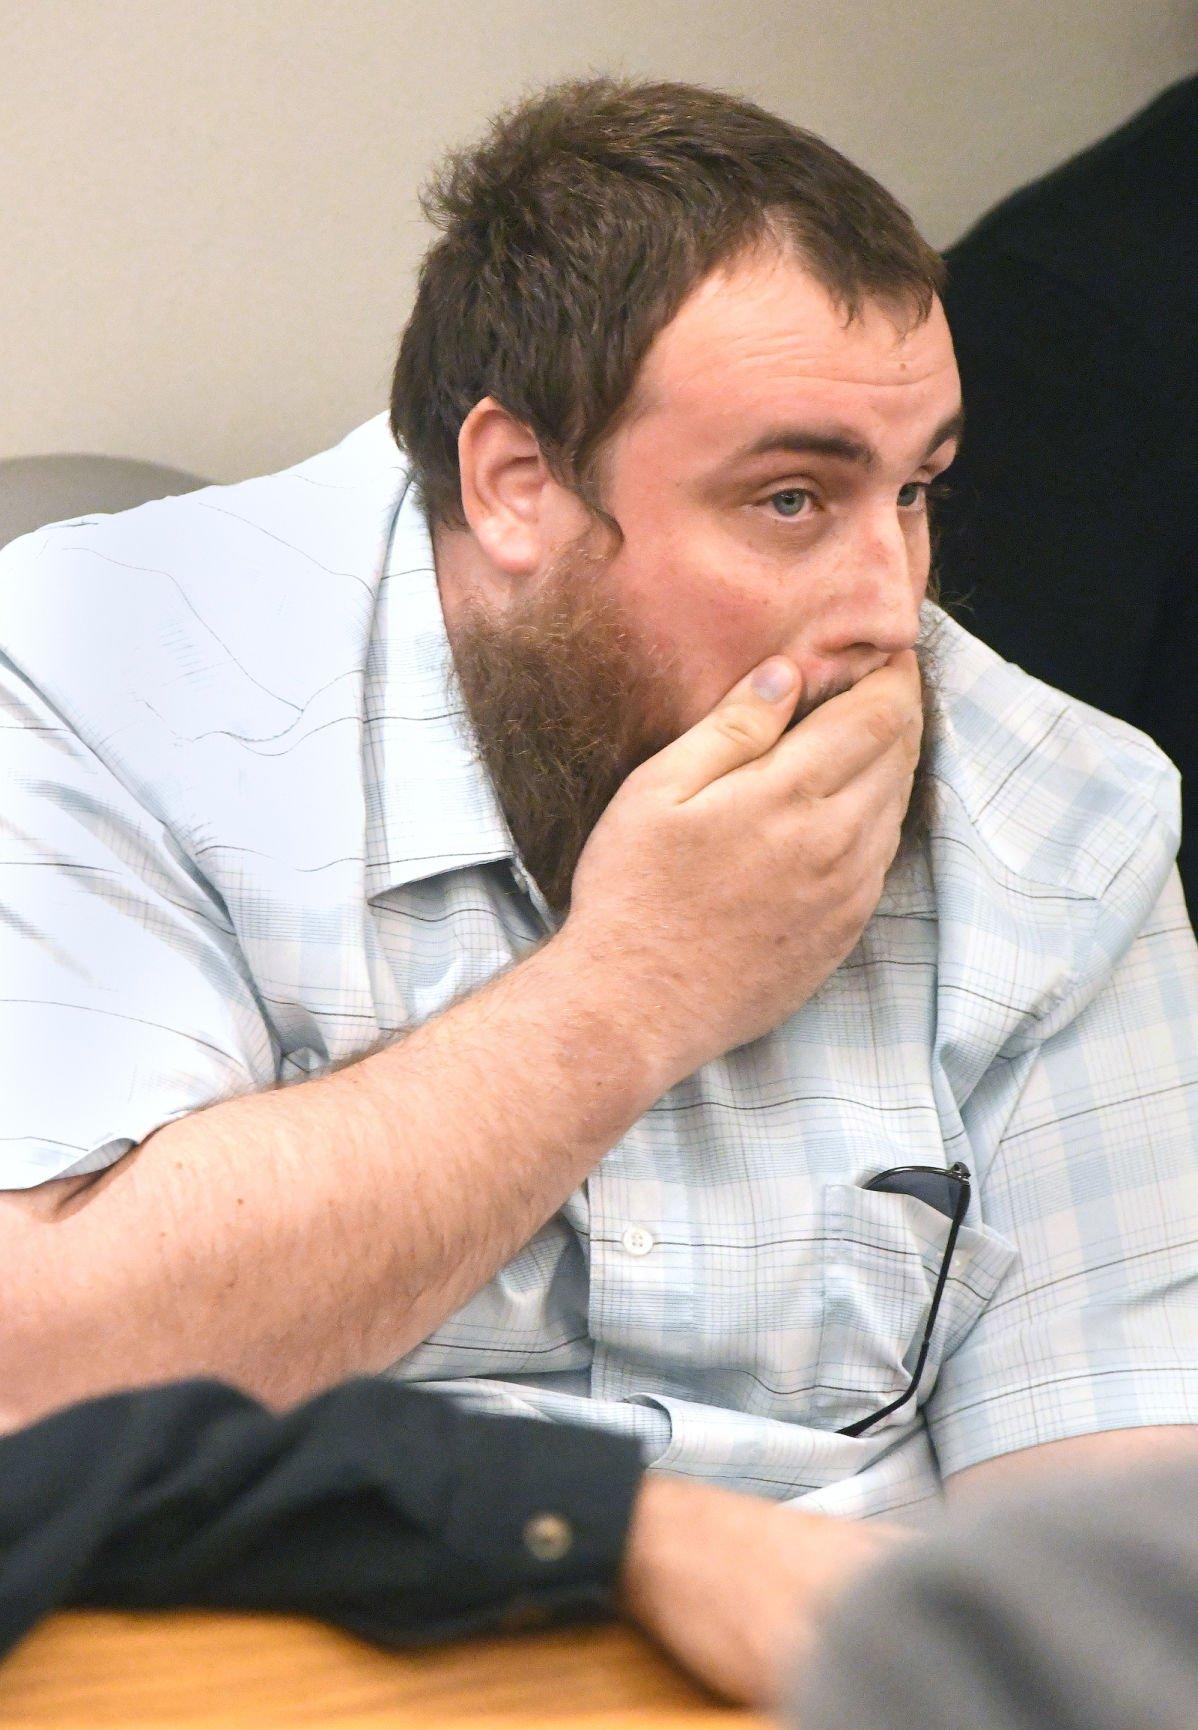 McKee Sentencing Dominant